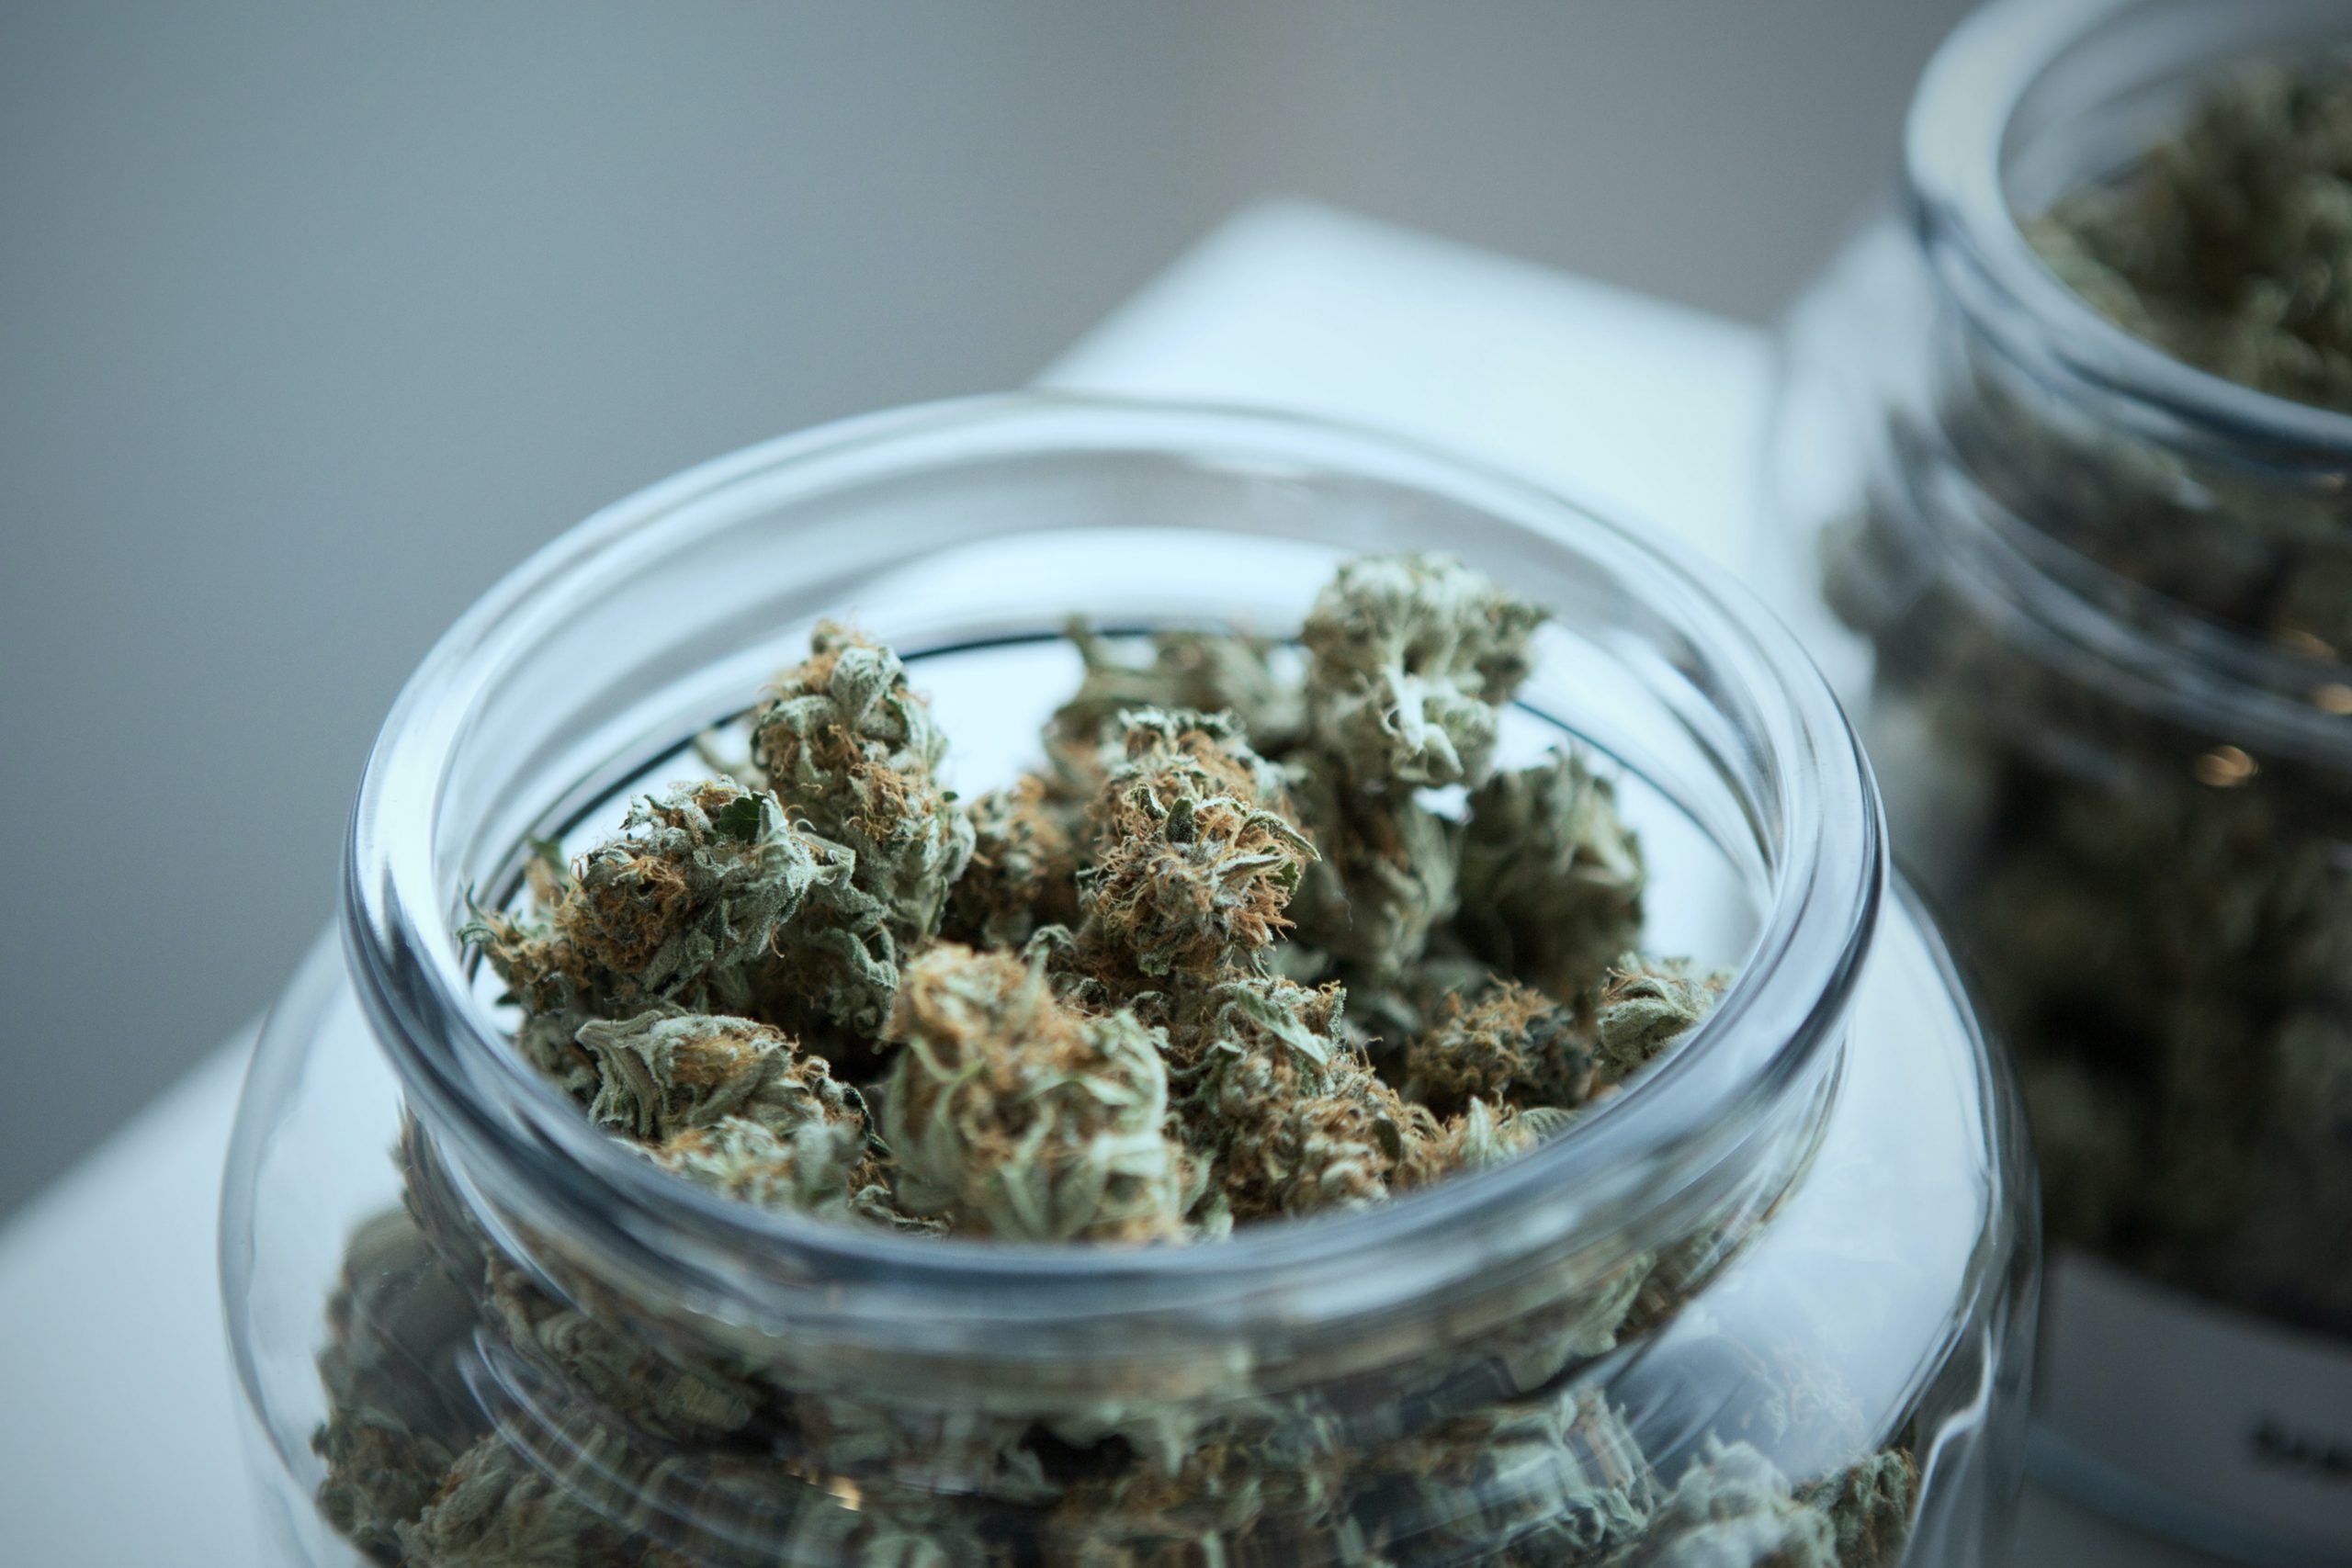 medicinal-cannabis-cryptocurrency-blockchain-m2bio-Willem-Jonker